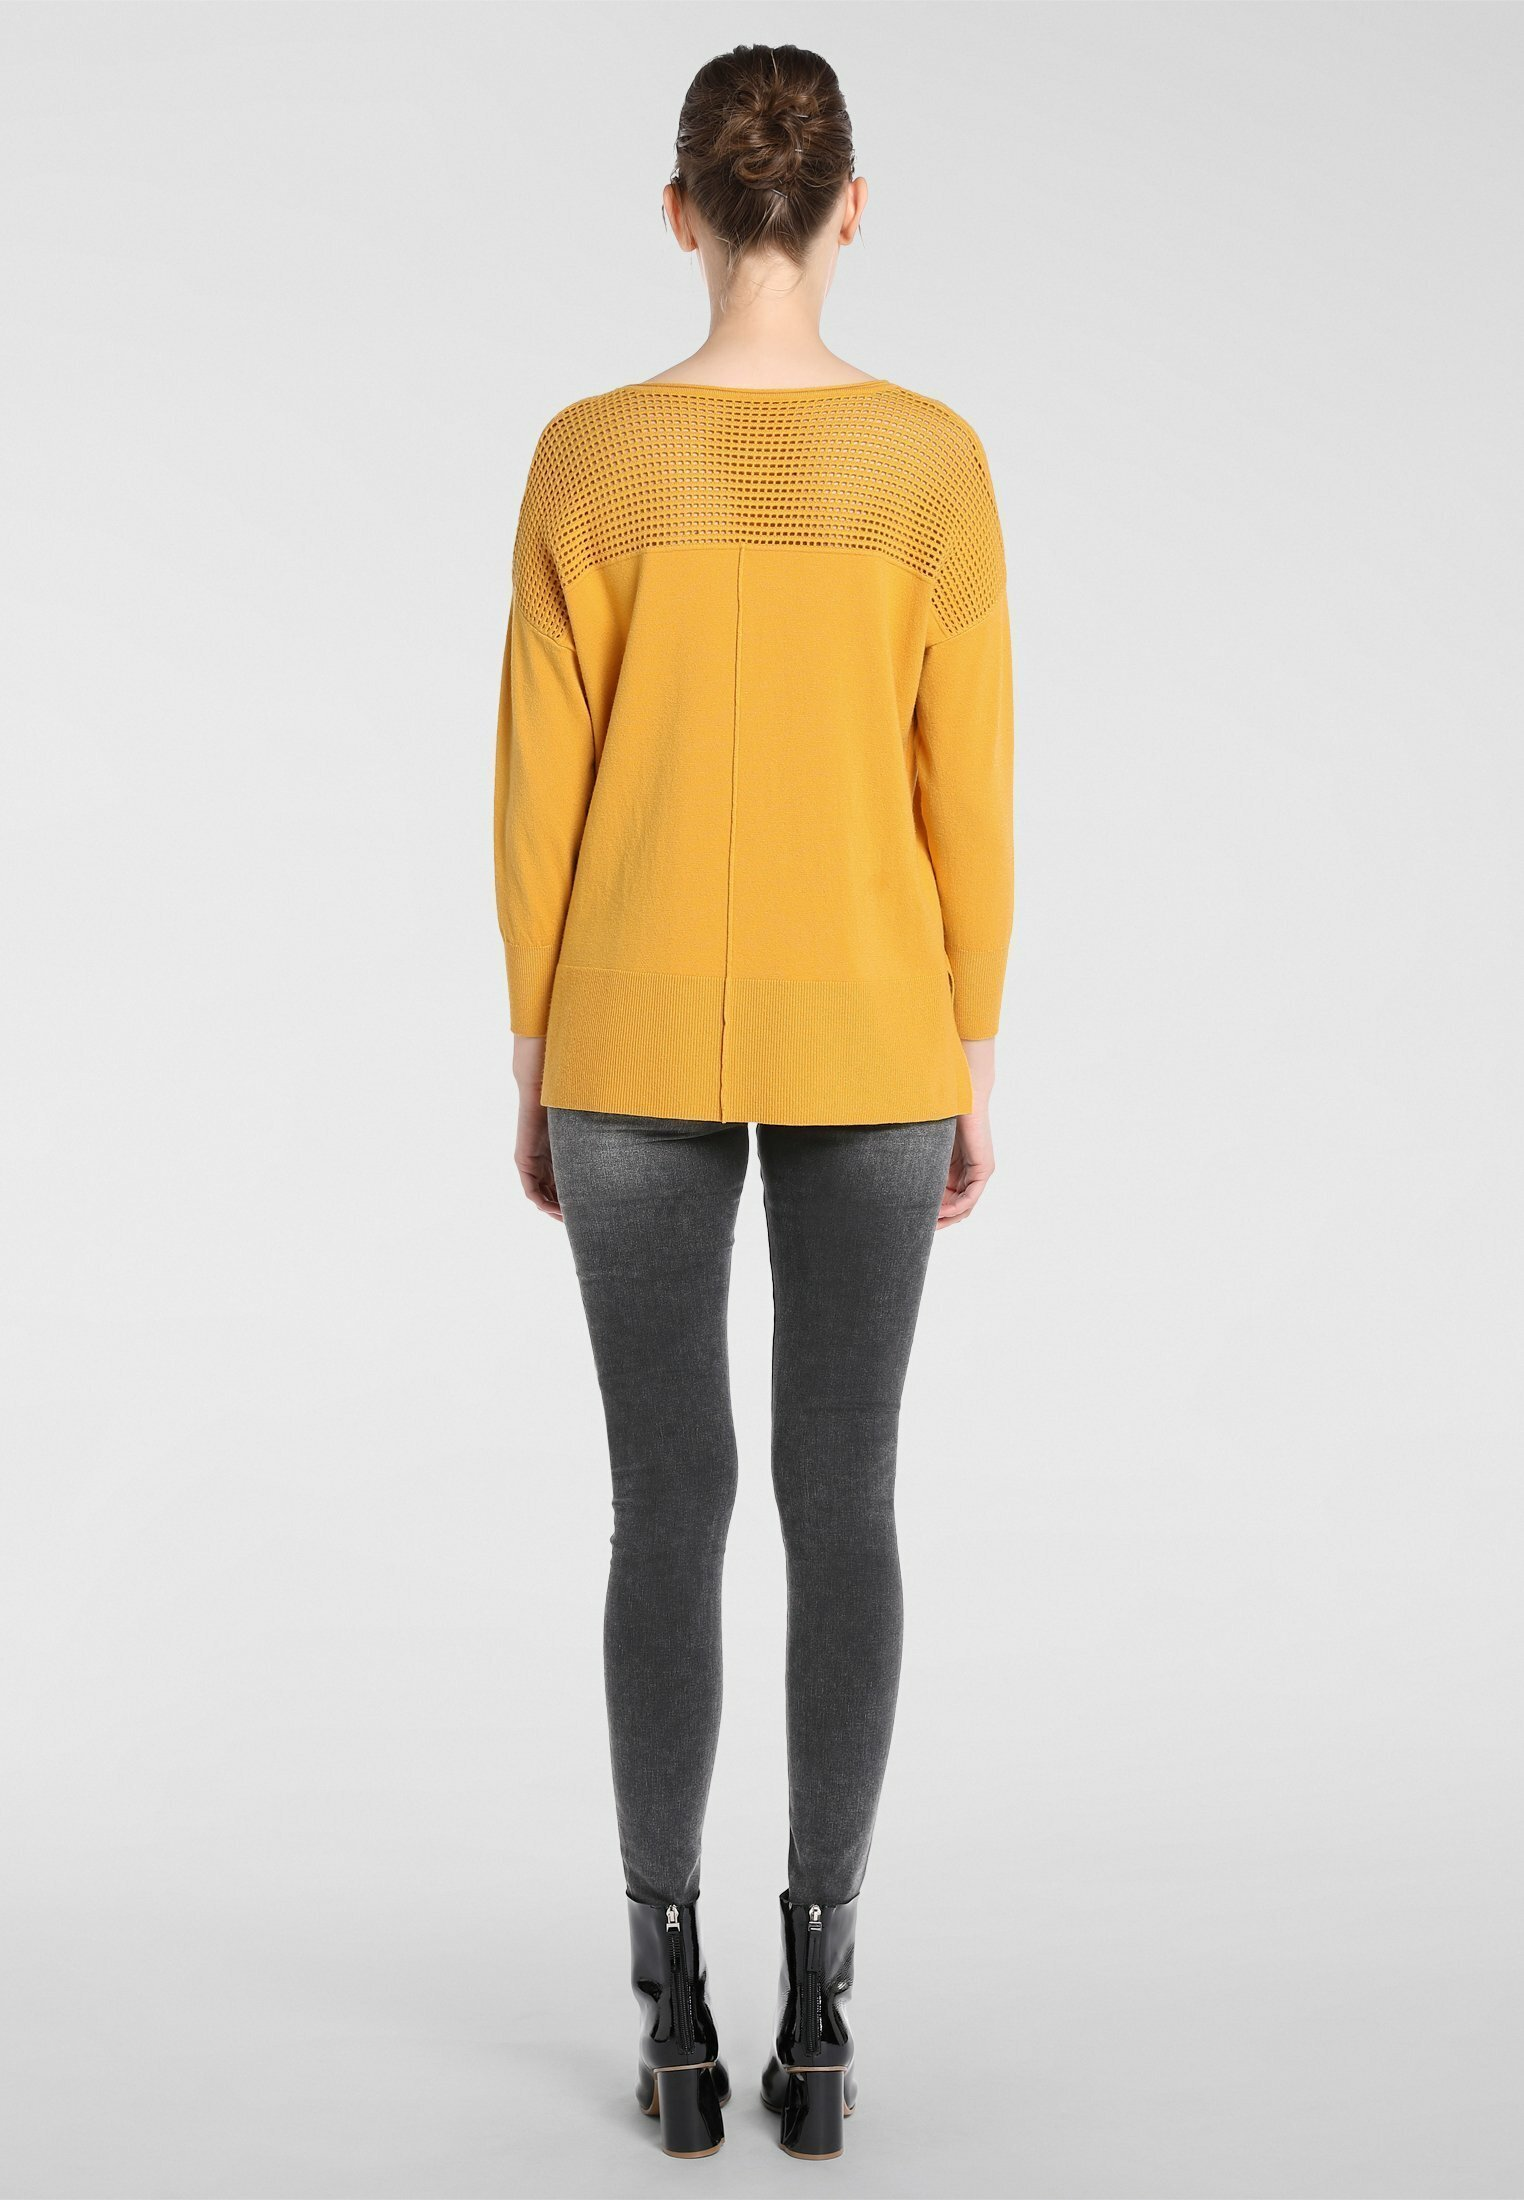 Cheap Women's Clothing Apart Jumper gelb Wqja8PFu5